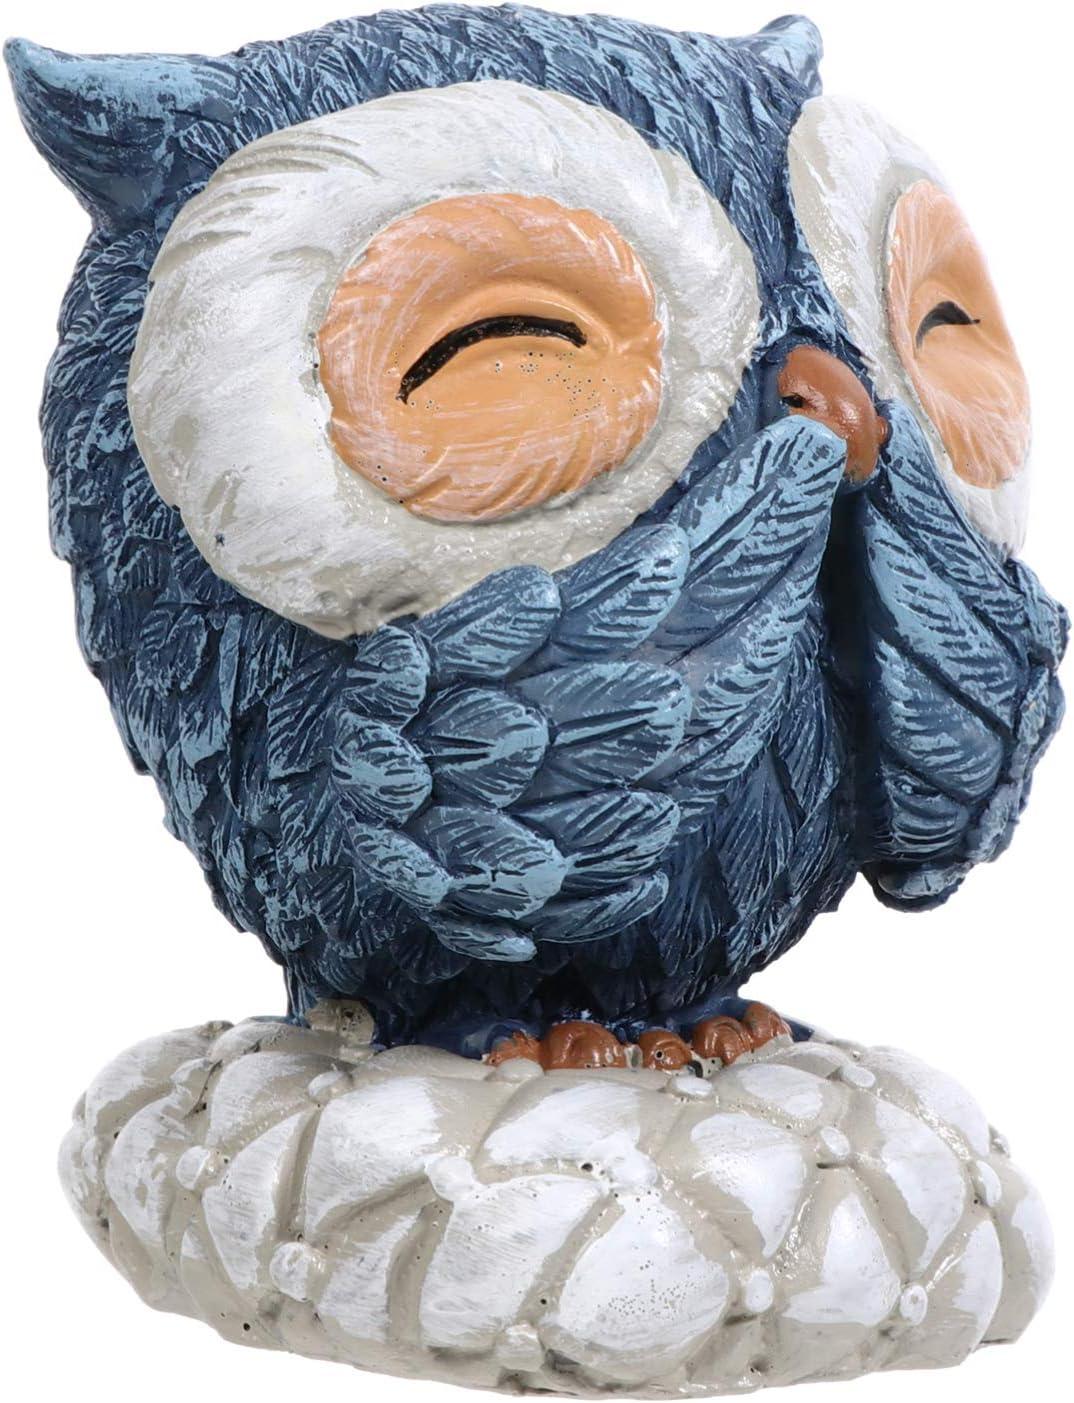 Homoyoyo Estatuilla de Búho de Resina Modelo Animal Estatua Mesa Escritorio Exhibición Colección de Arte Escultura Figura de Acción de Animal Pequeño para El Hogar Estante Decoración de